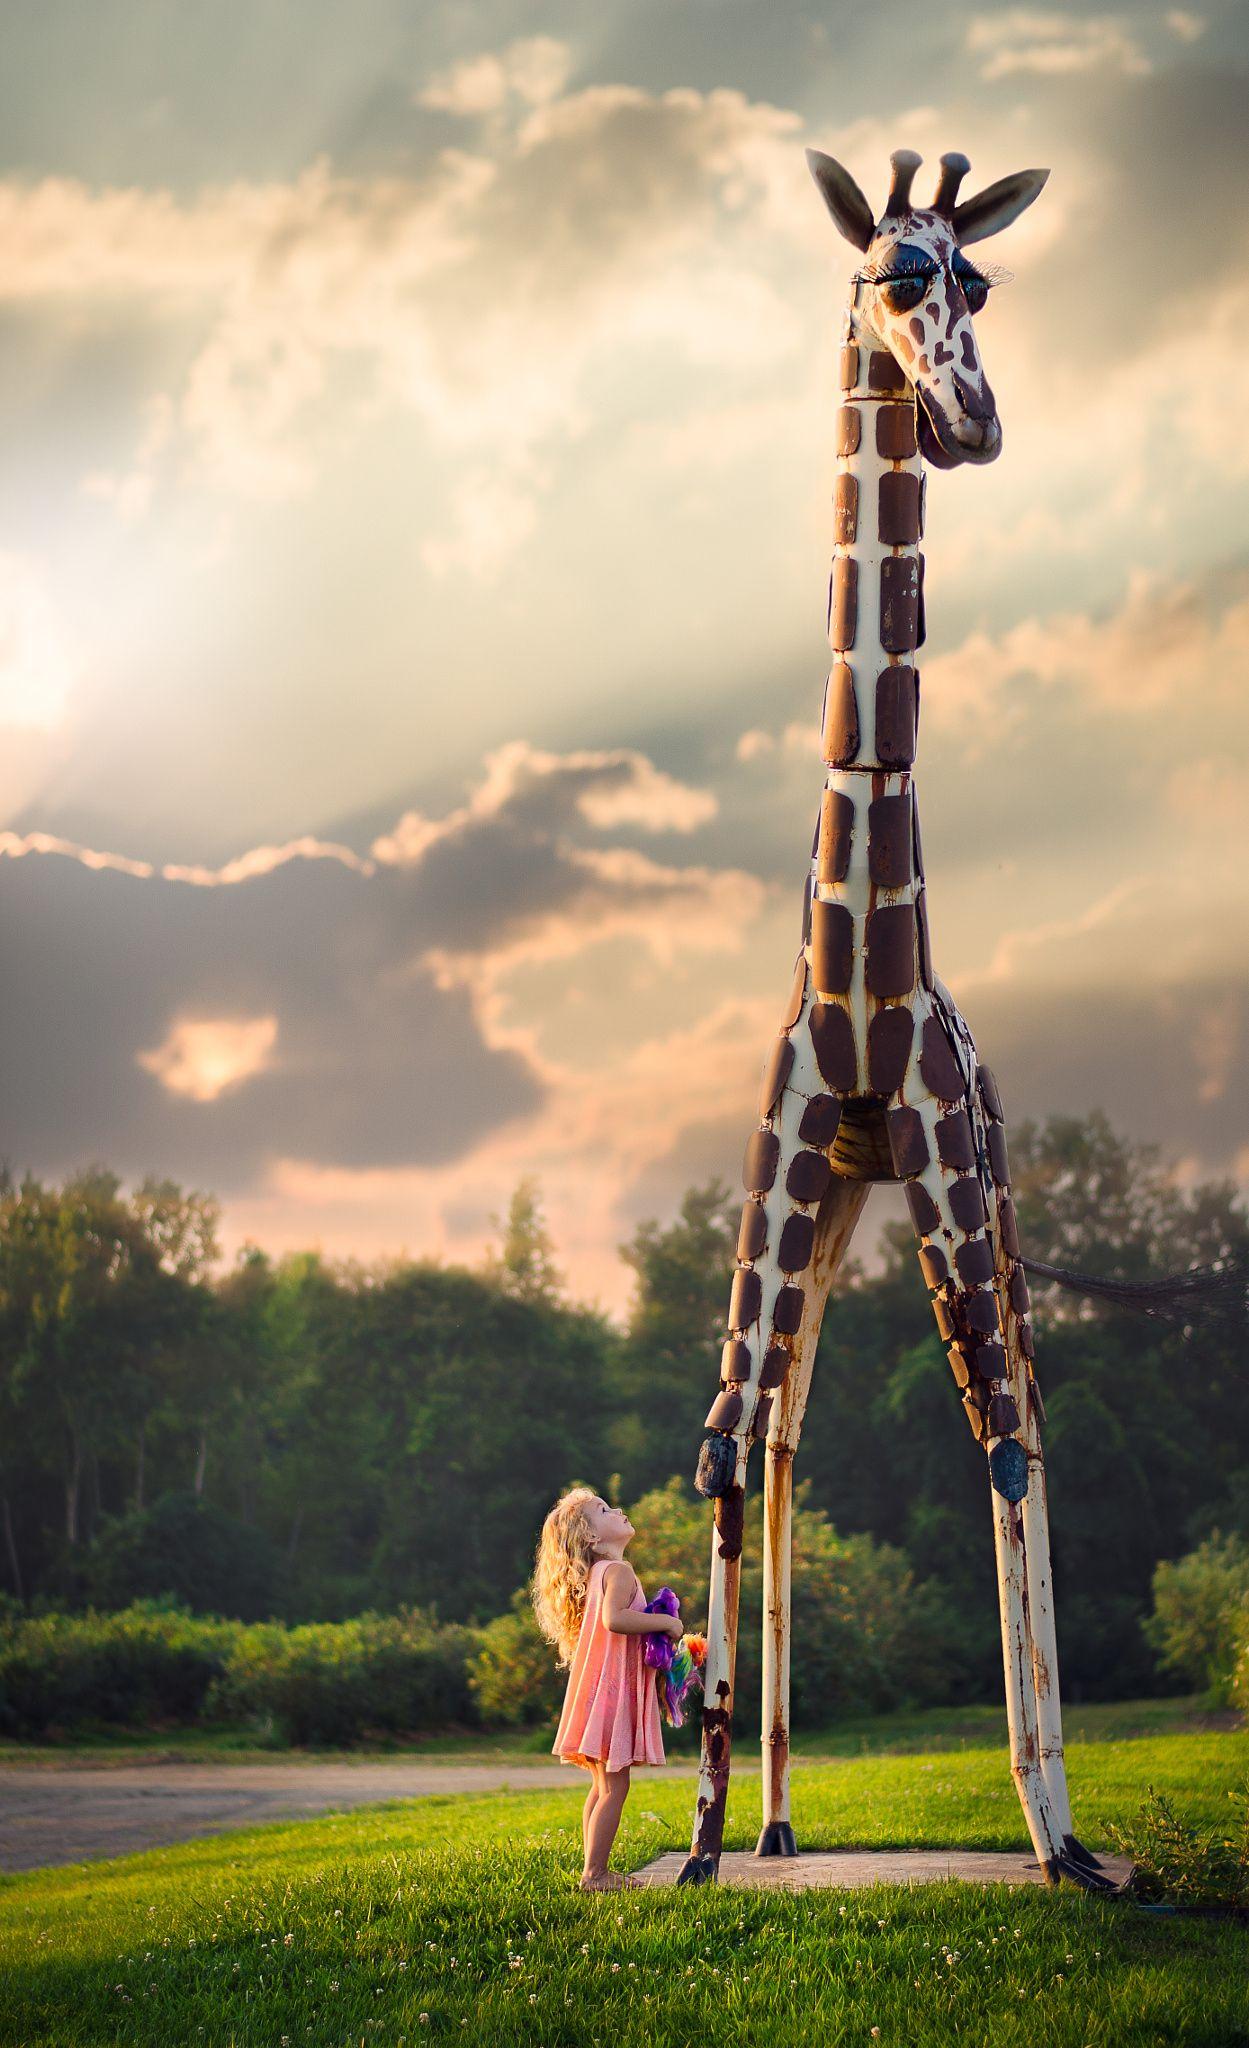 Dream BIG by Jessica Kittredge on 500px